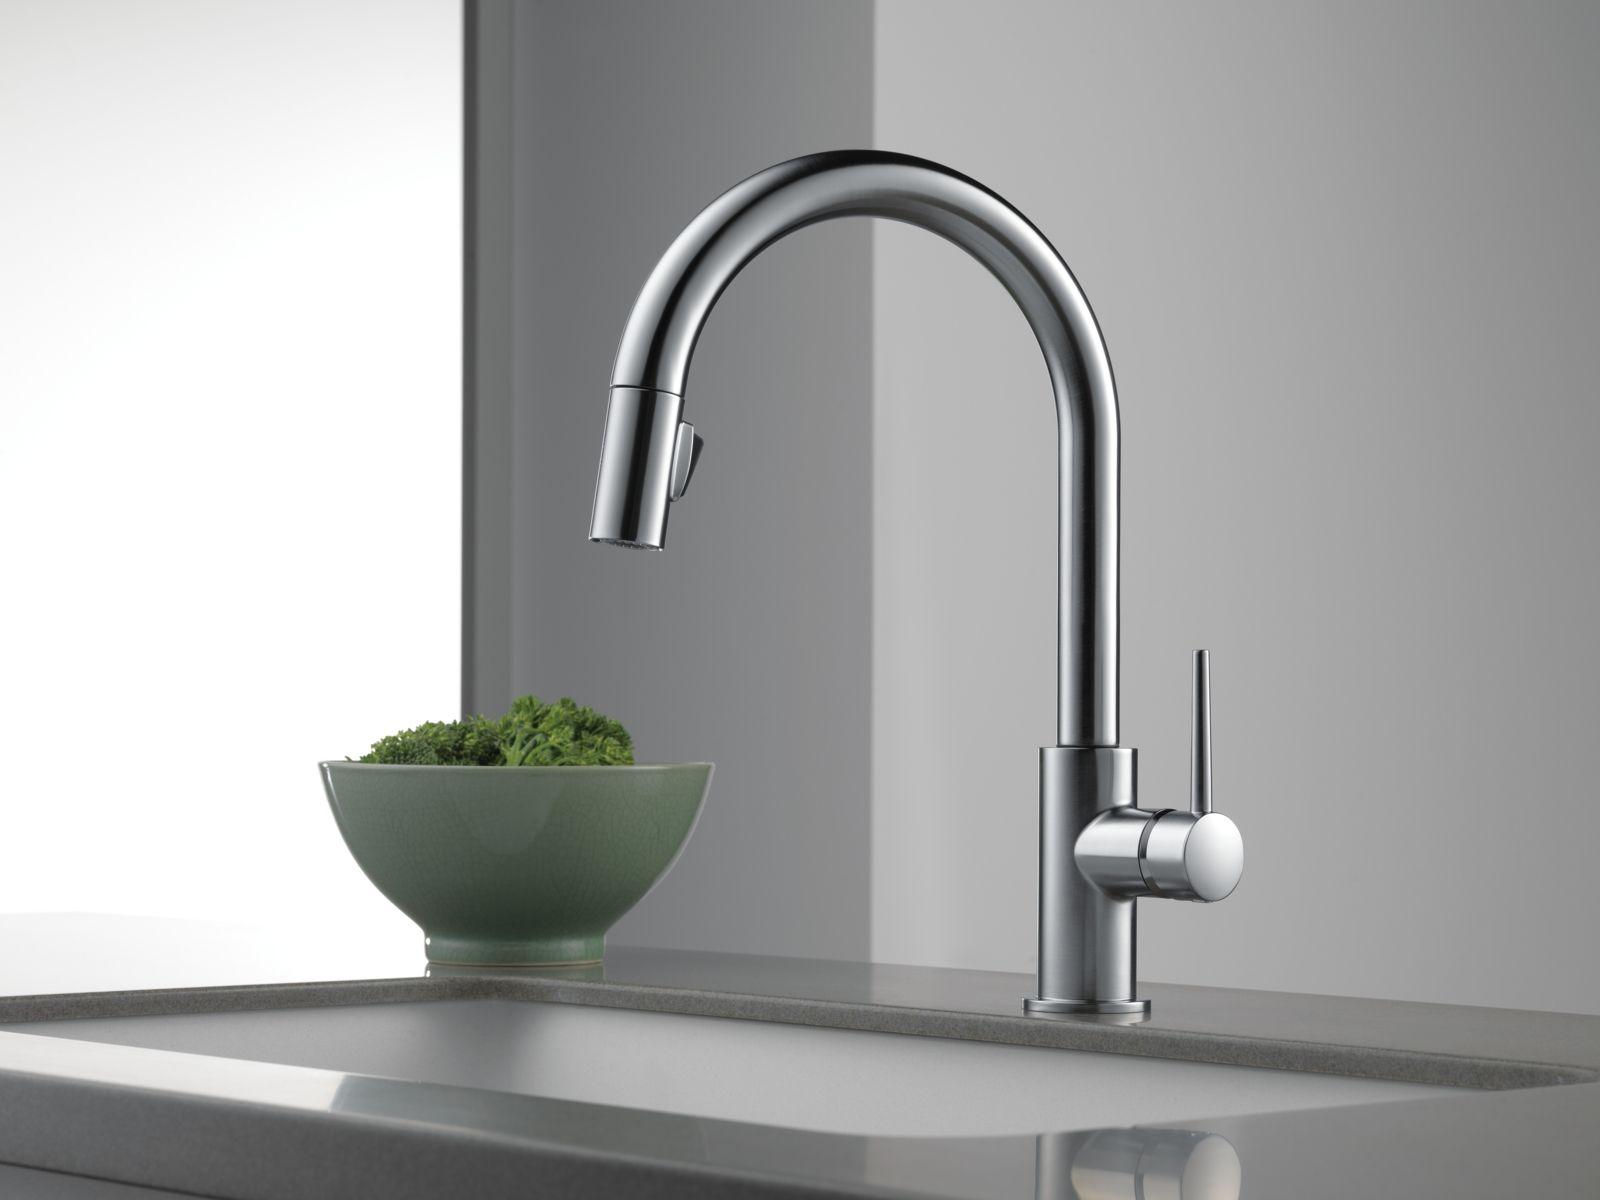 Moen High Arc Kitchen Faucet Touch Sensor Kitchen Faucet Lowes Dandk Organizer